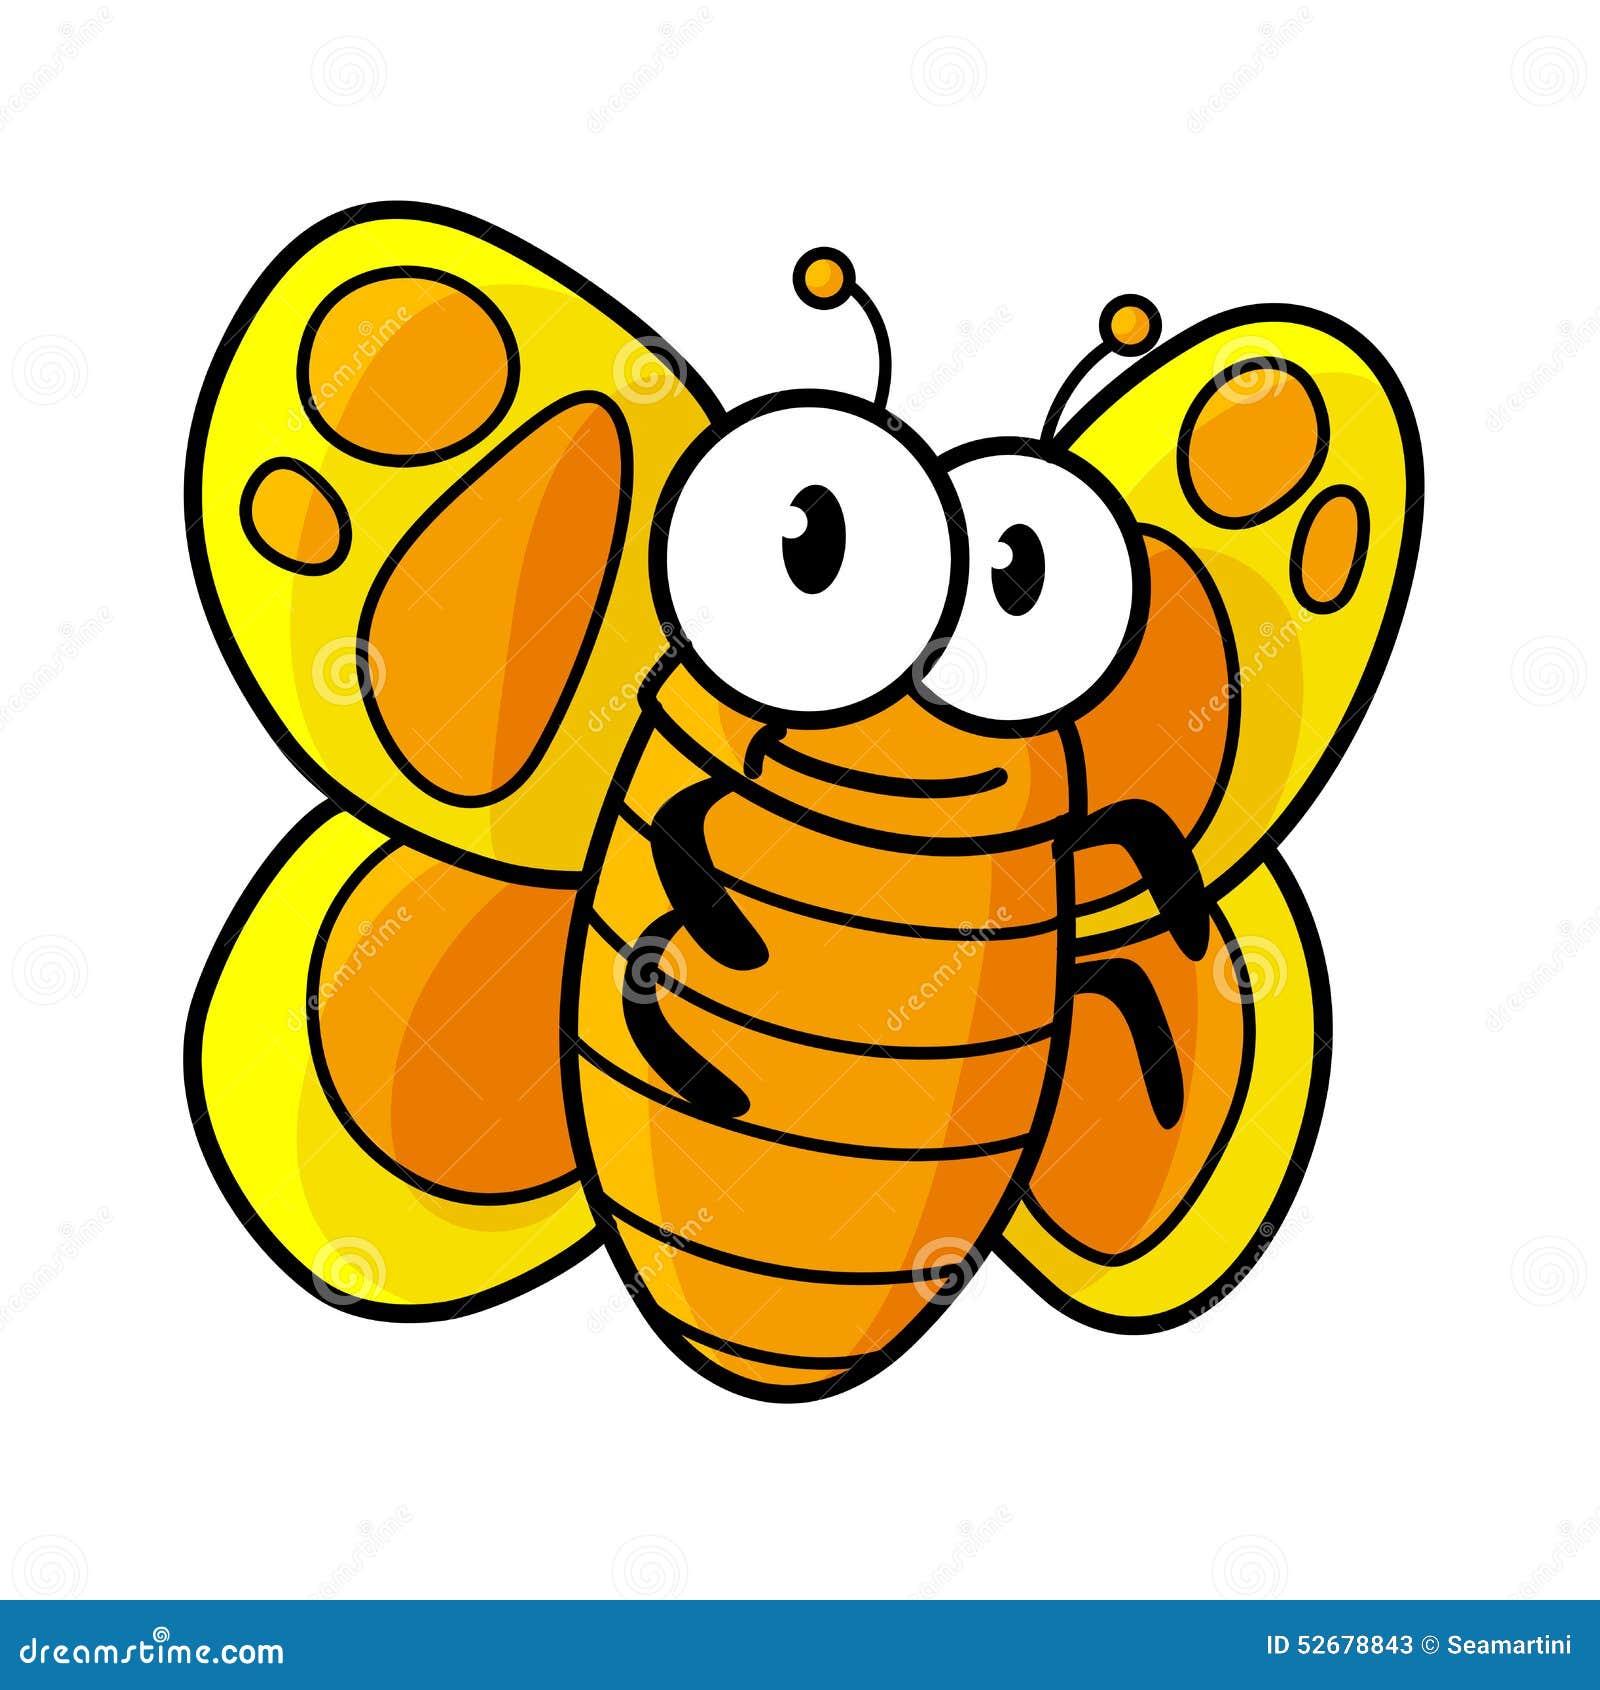 Het gele bevlekte karakter van het vlinderbeeldverhaal